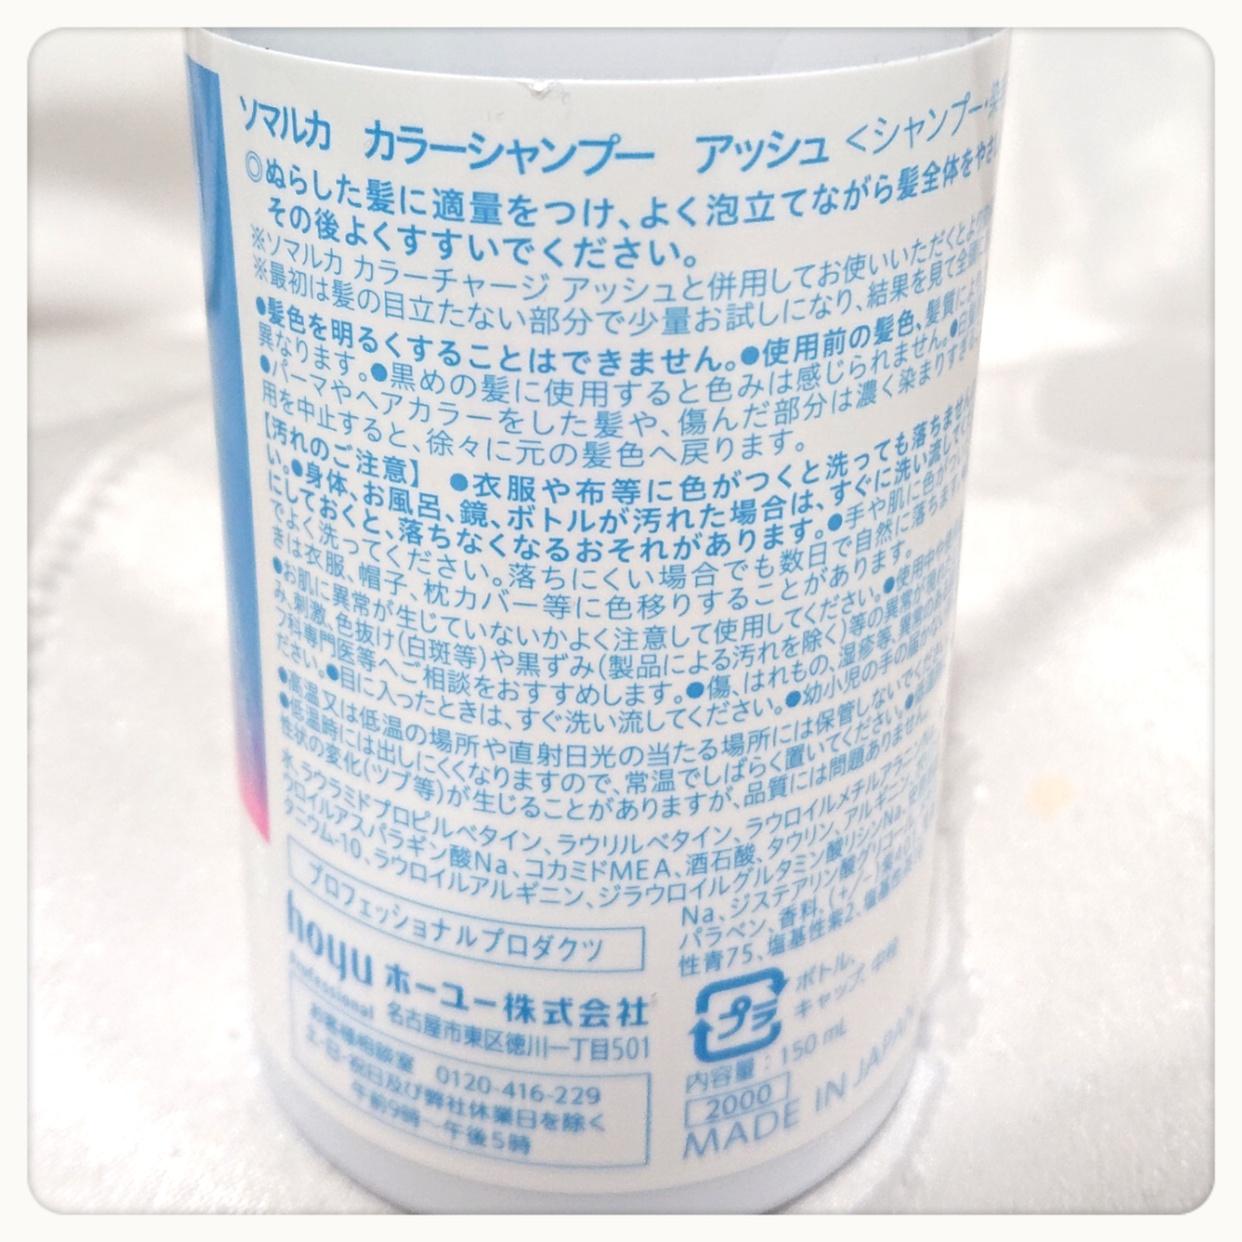 hoyu(ホーユー)ソマルカ カラーシャンプーを使ったnakoさんのクチコミ画像2